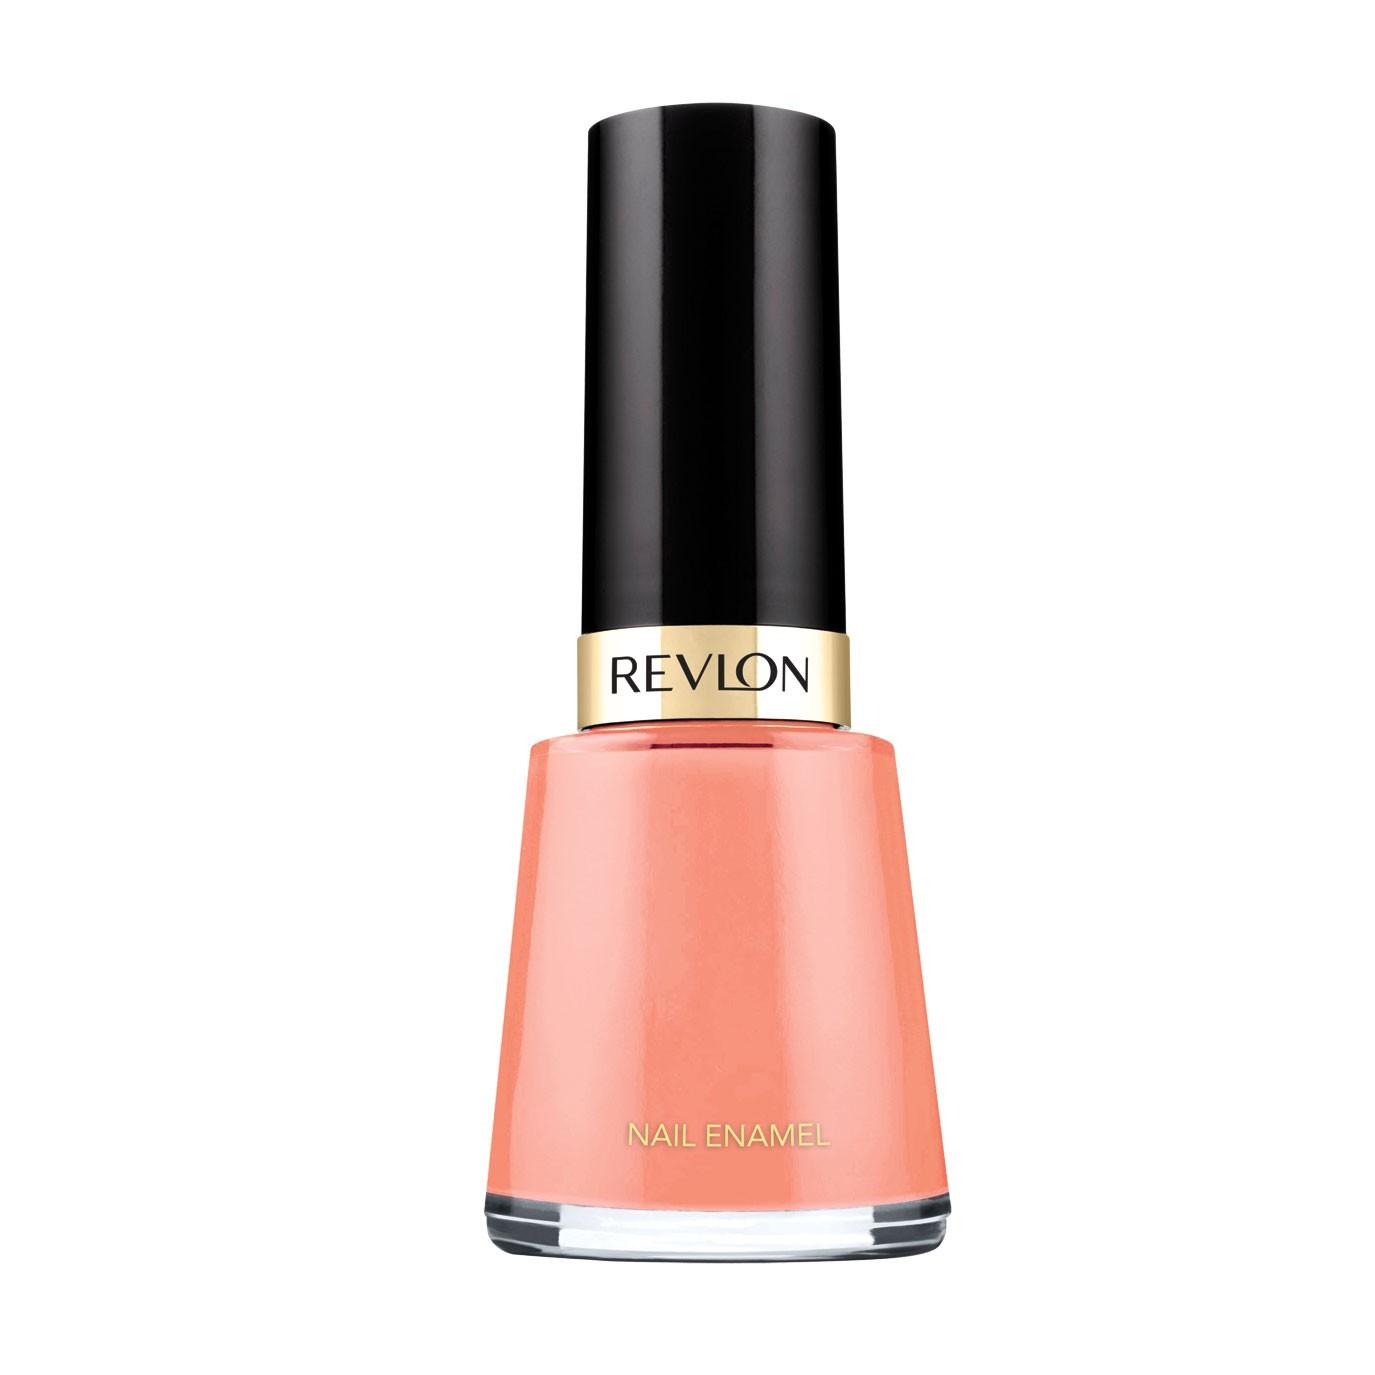 Revlon Nail Polish - Nail Enamel | beautyPALAST.ch